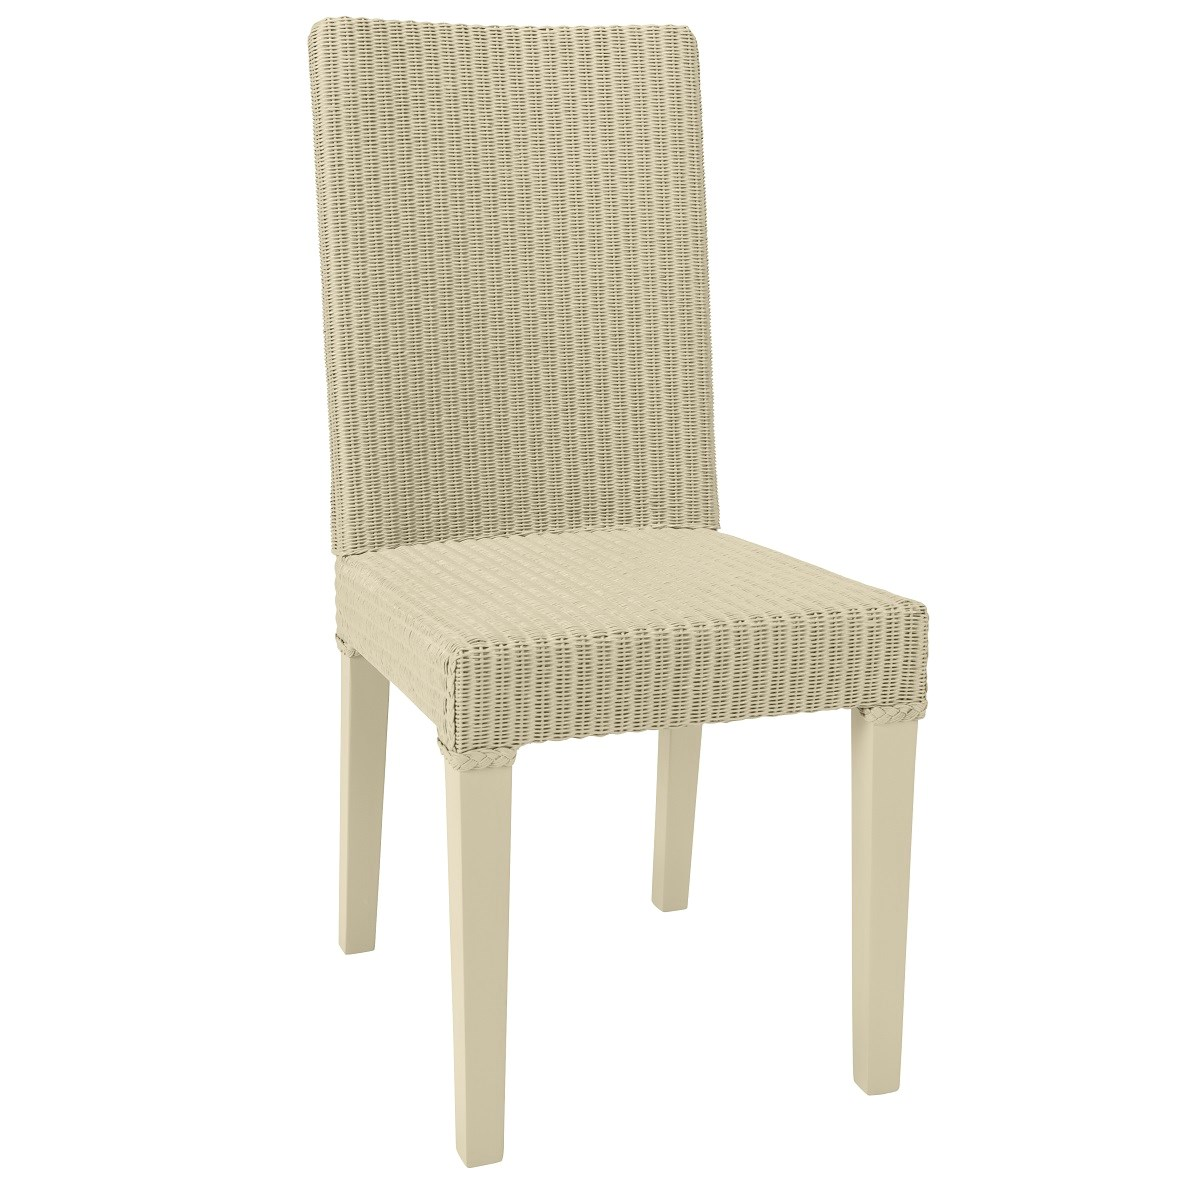 Chaise en Lloyd Loom beige clair